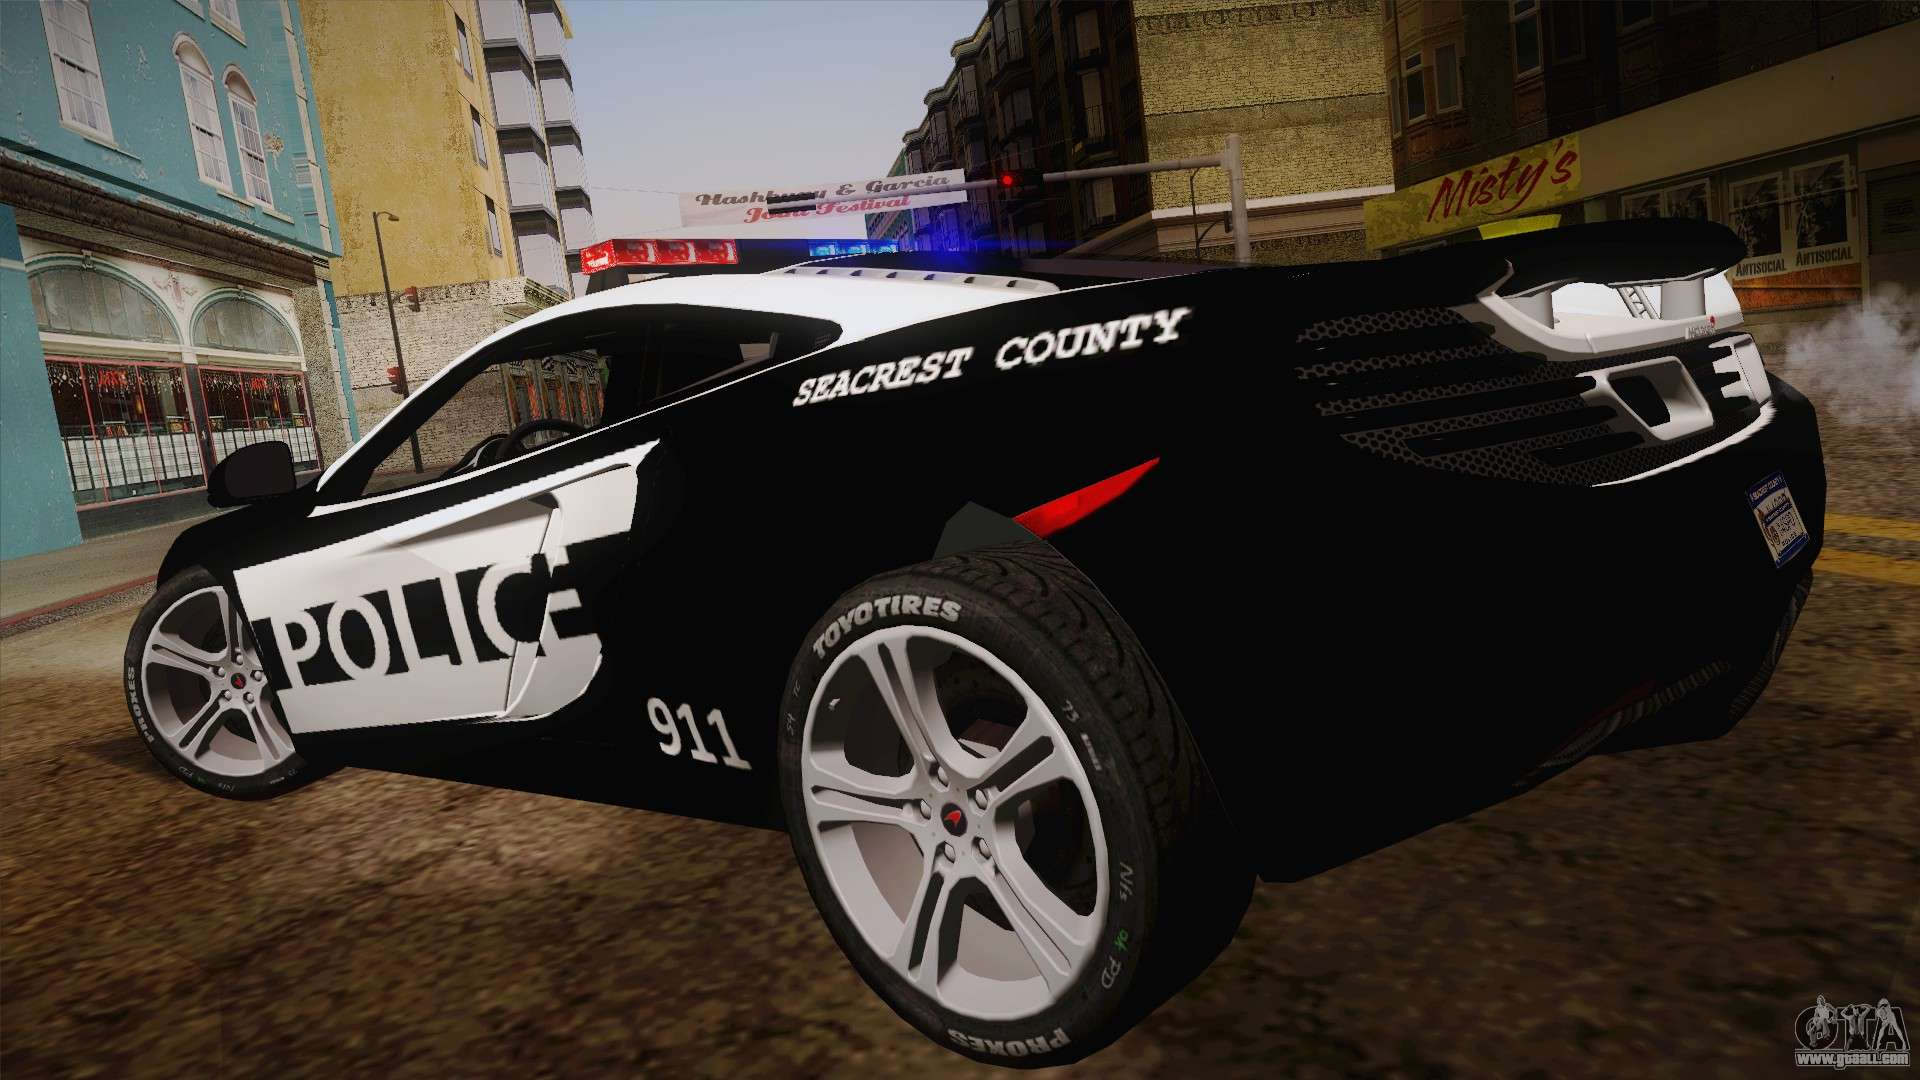 McLaren MP4-12C Police Car for GTA San Andreas Gta San Andreas Police Cars